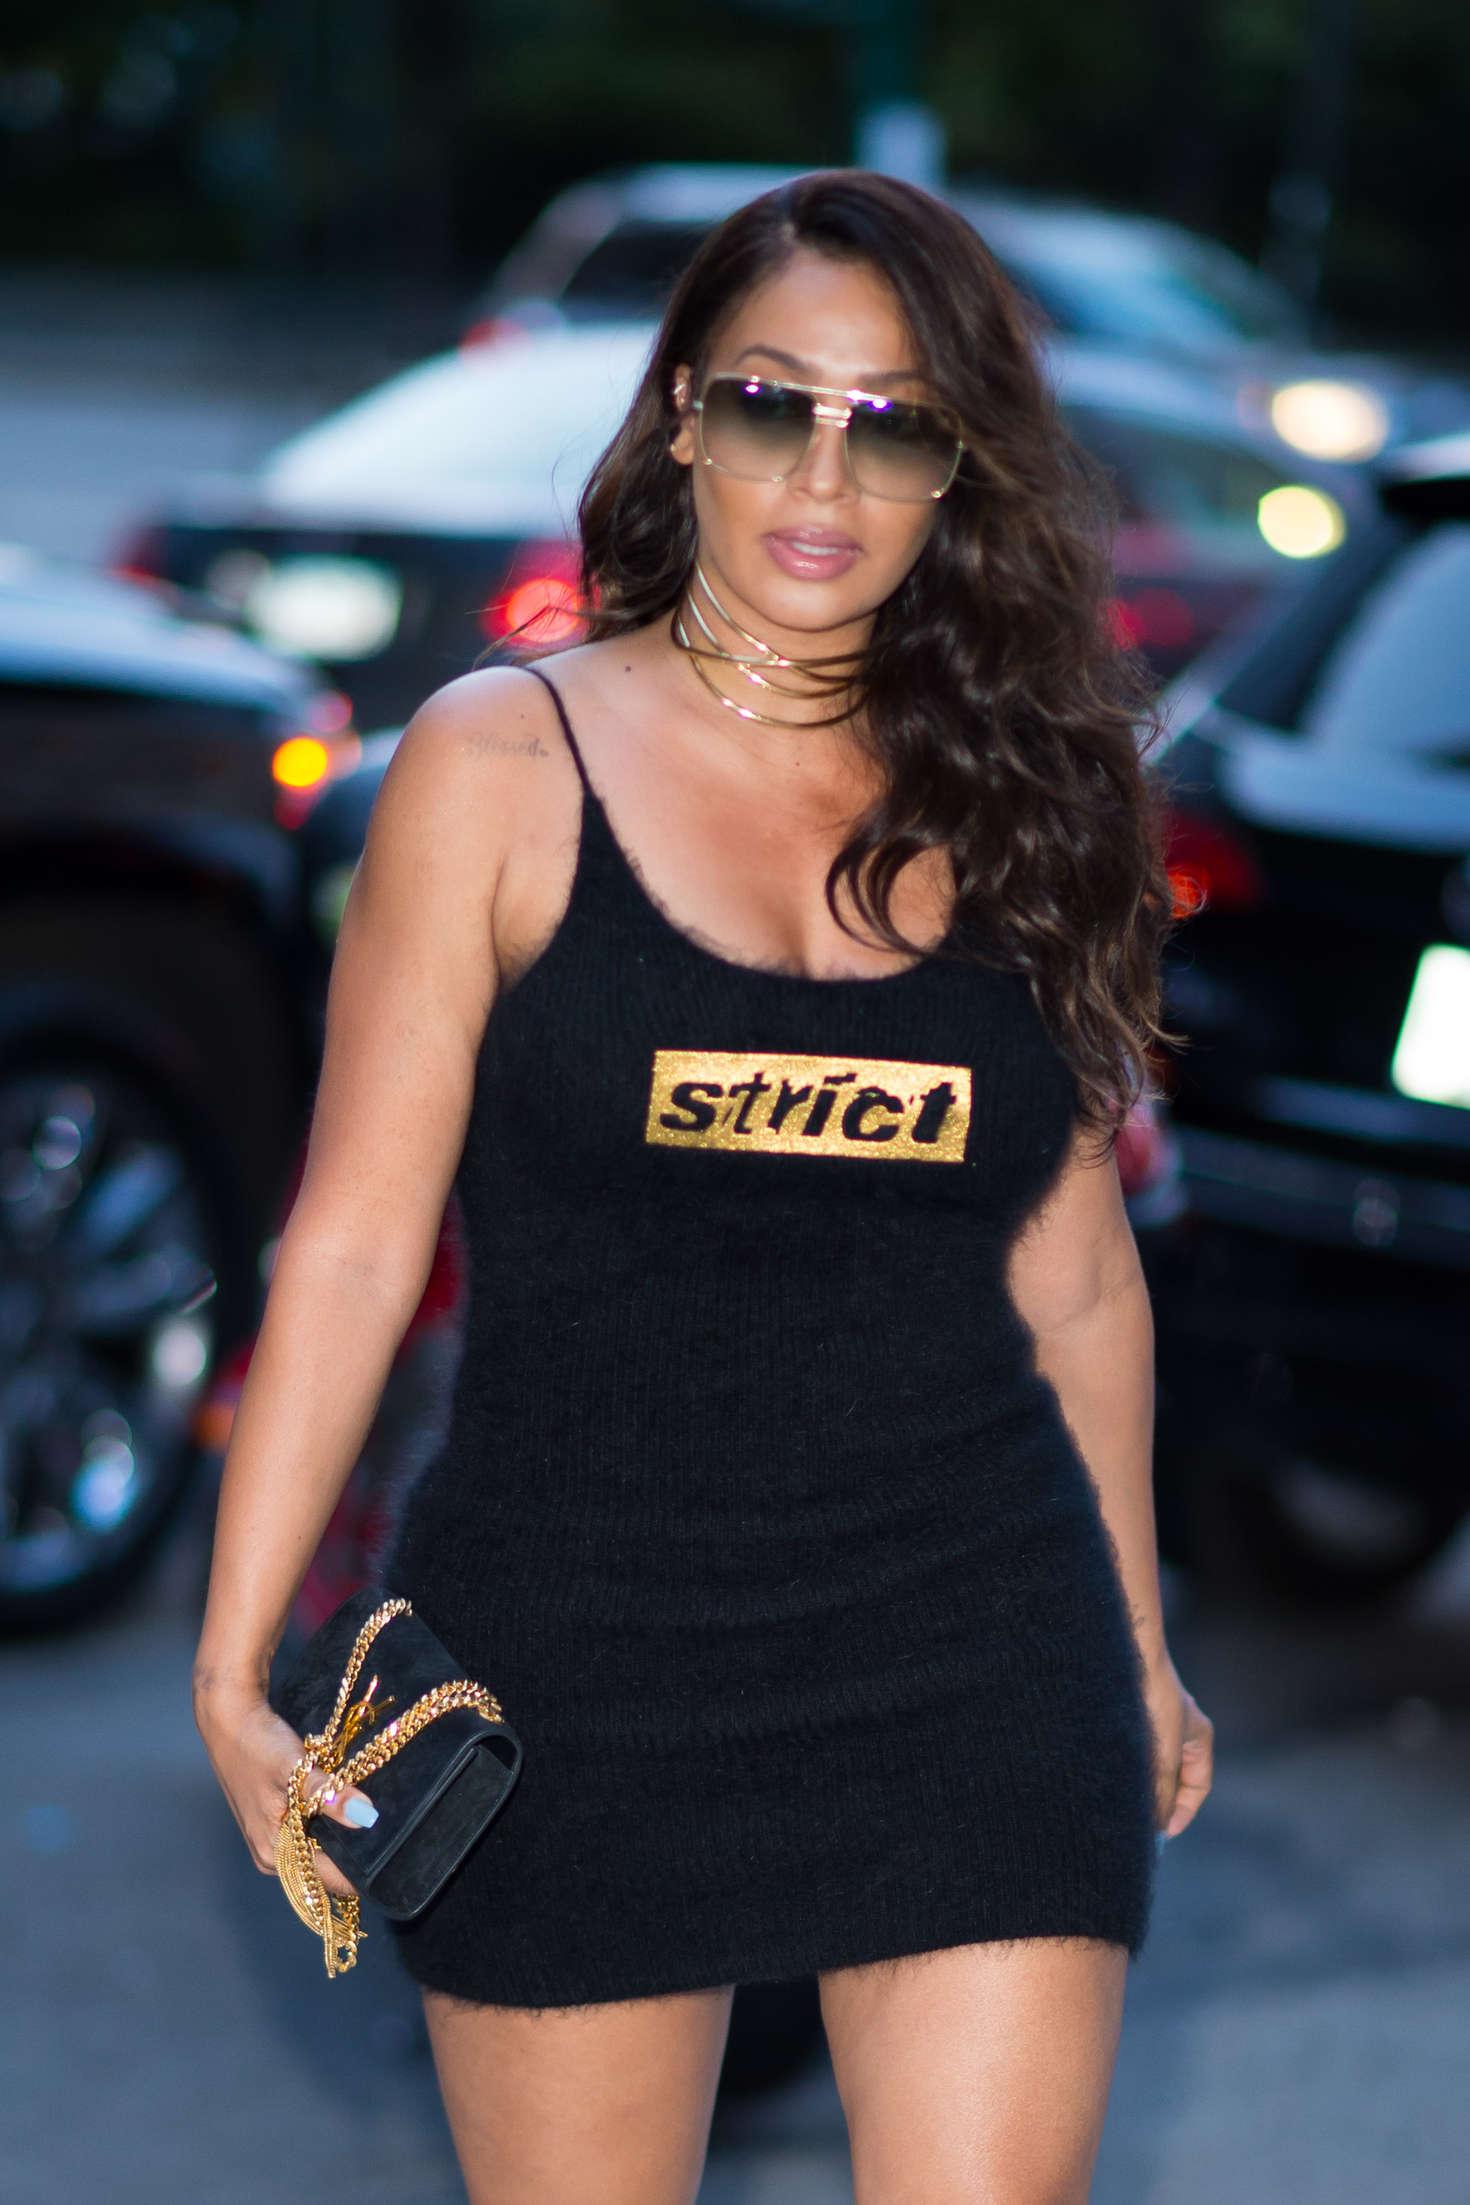 La La Anthony in Black Mini Dress out in New York City